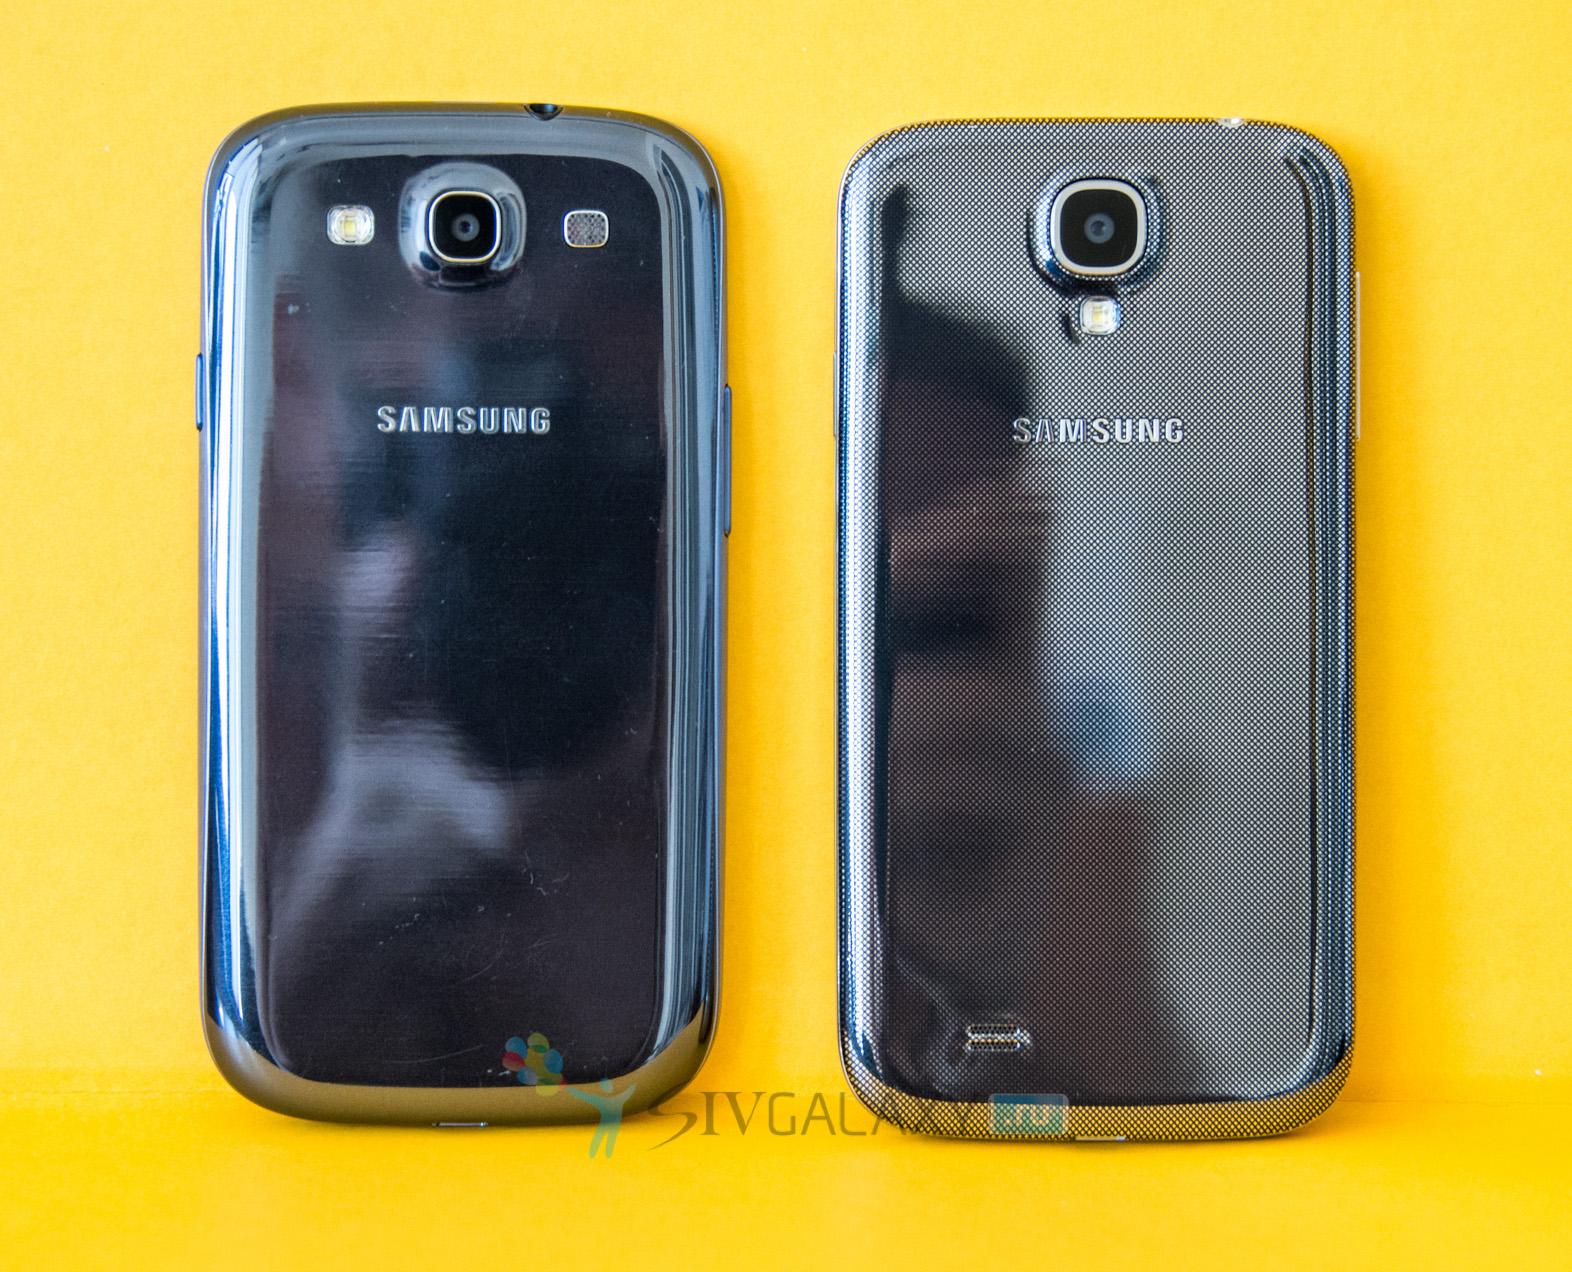 Фото внешнего вида Samsung Galaxy S4 и S3